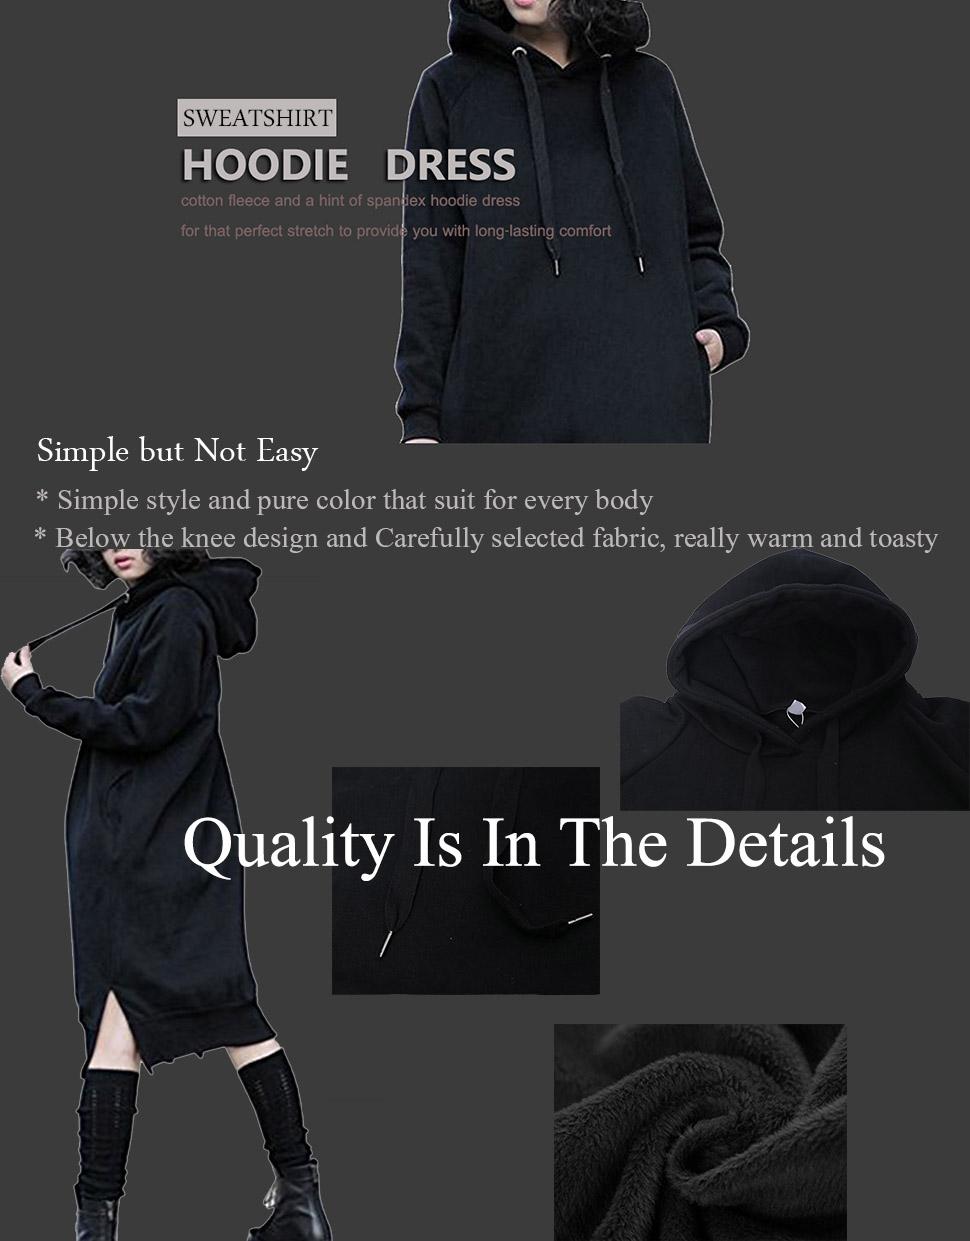 68b74a8f716 Women s Thickening Long Fleece Sweatshirt String Hoodie Dress Pullover Plus  Size